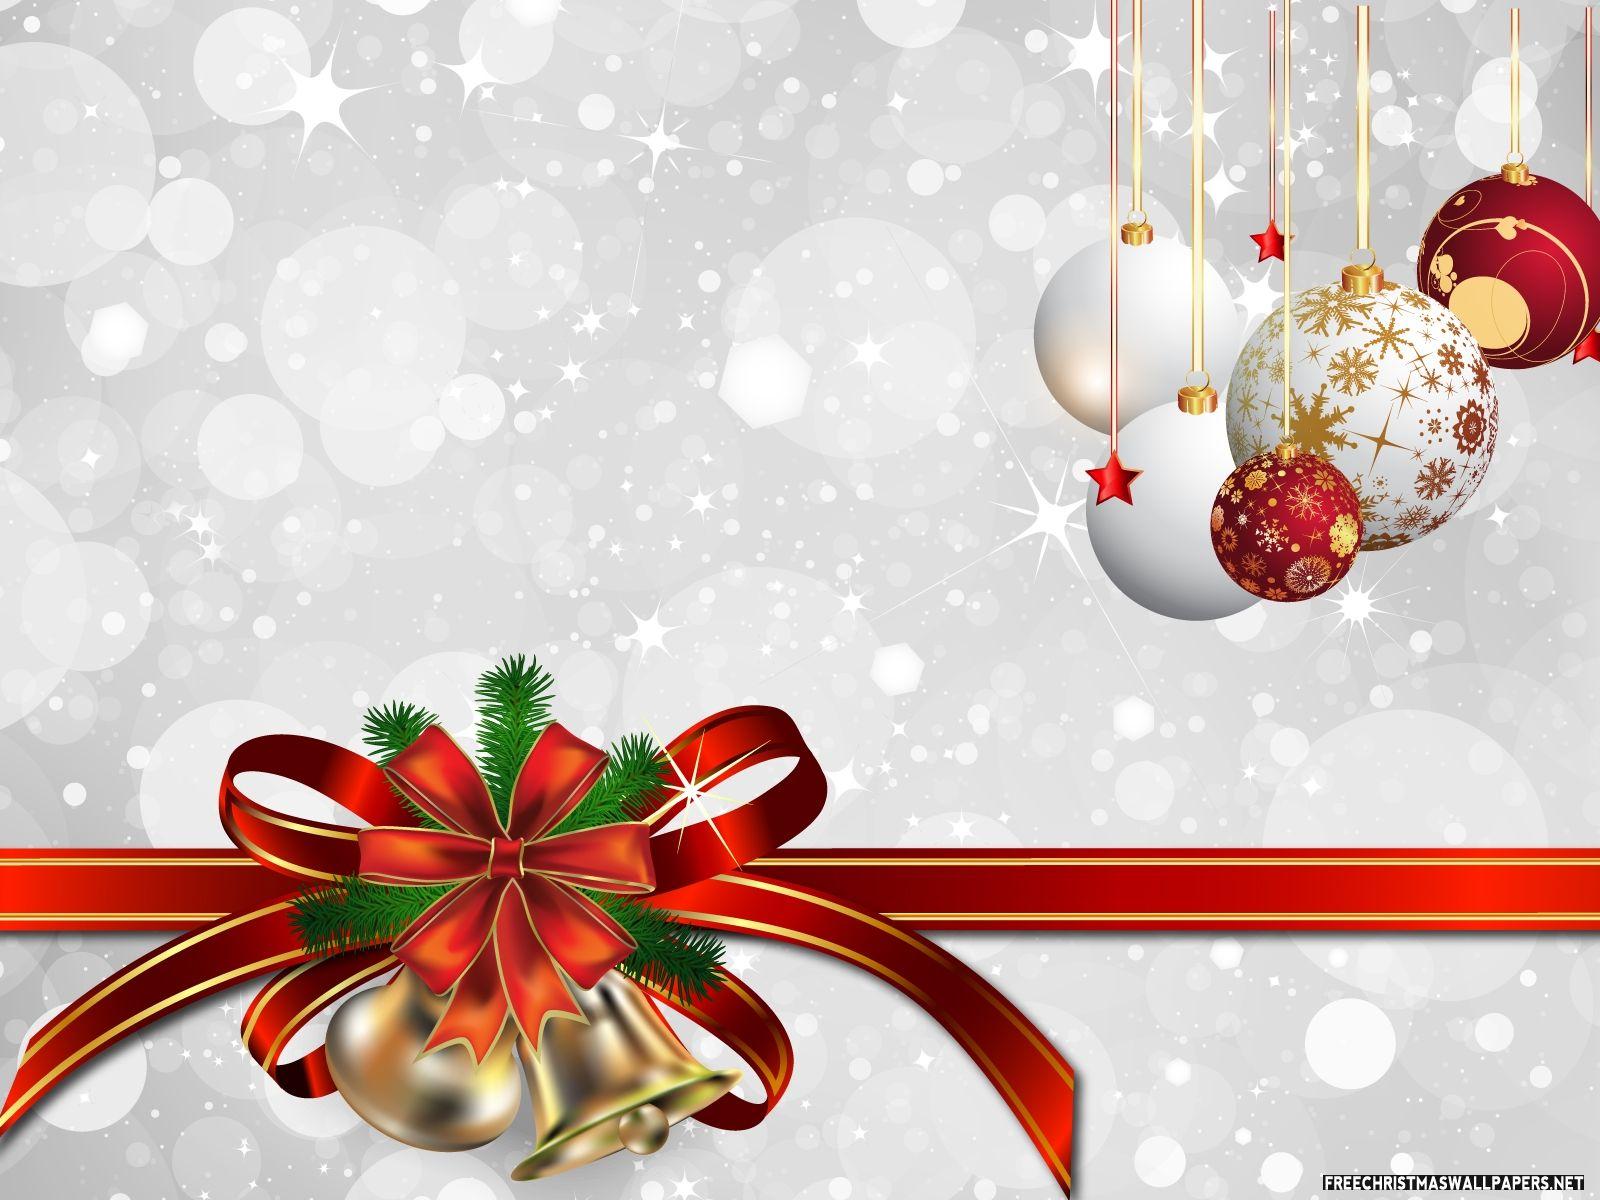 Merry Christmas Christmasdecorations Merry Christmas Wallpaper Christmas Wallpaper Hd Christmas Wallpaper Free